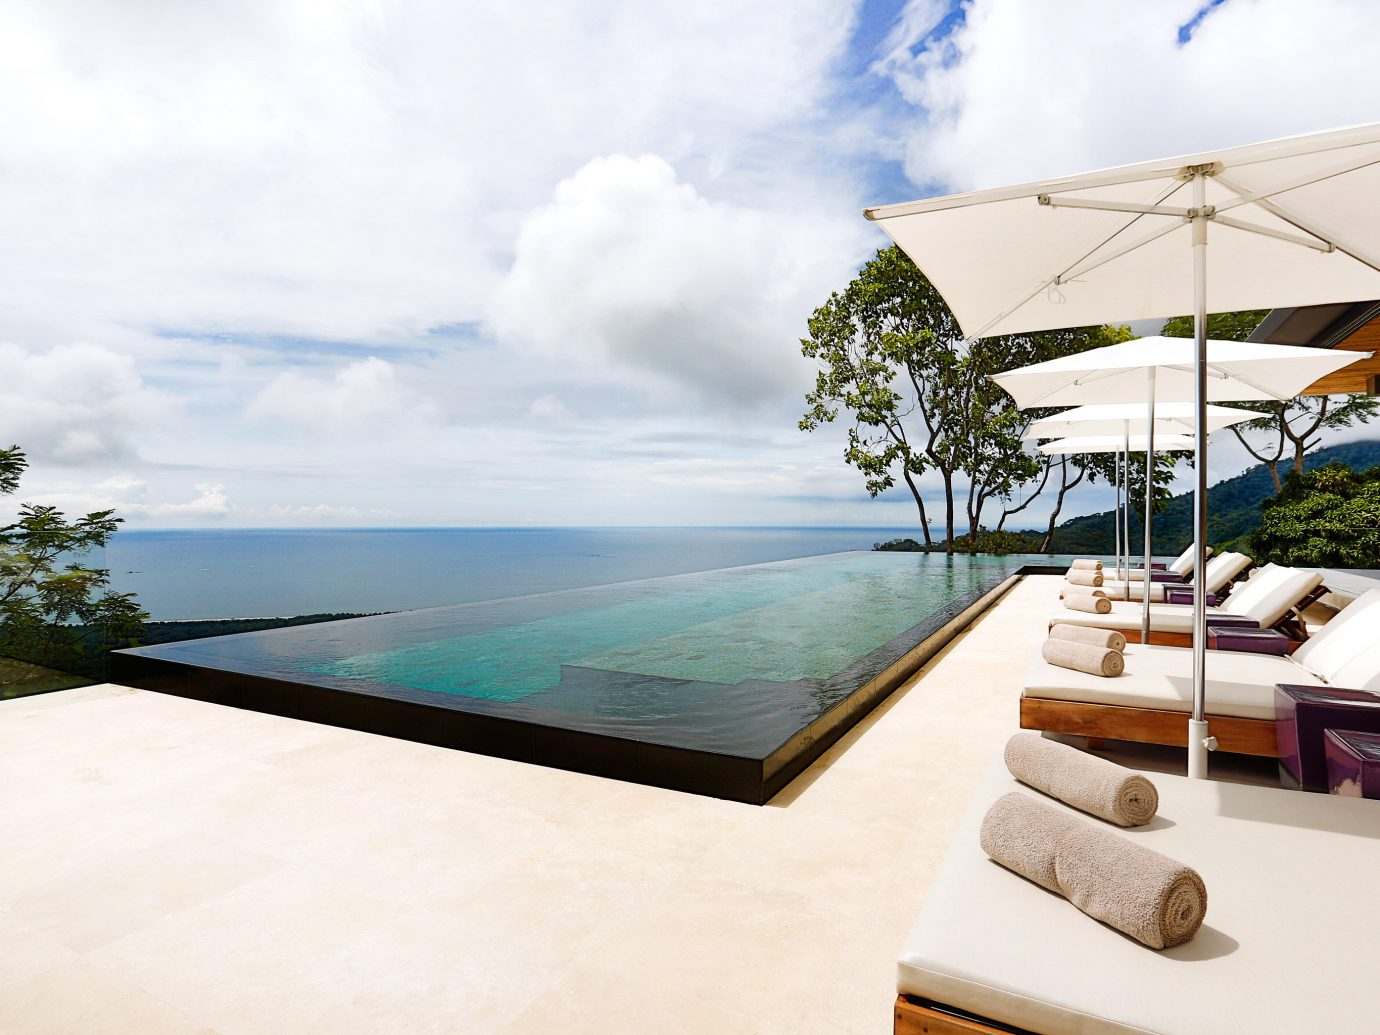 Infinity Pool At Kura Design Villas In Costa Rica